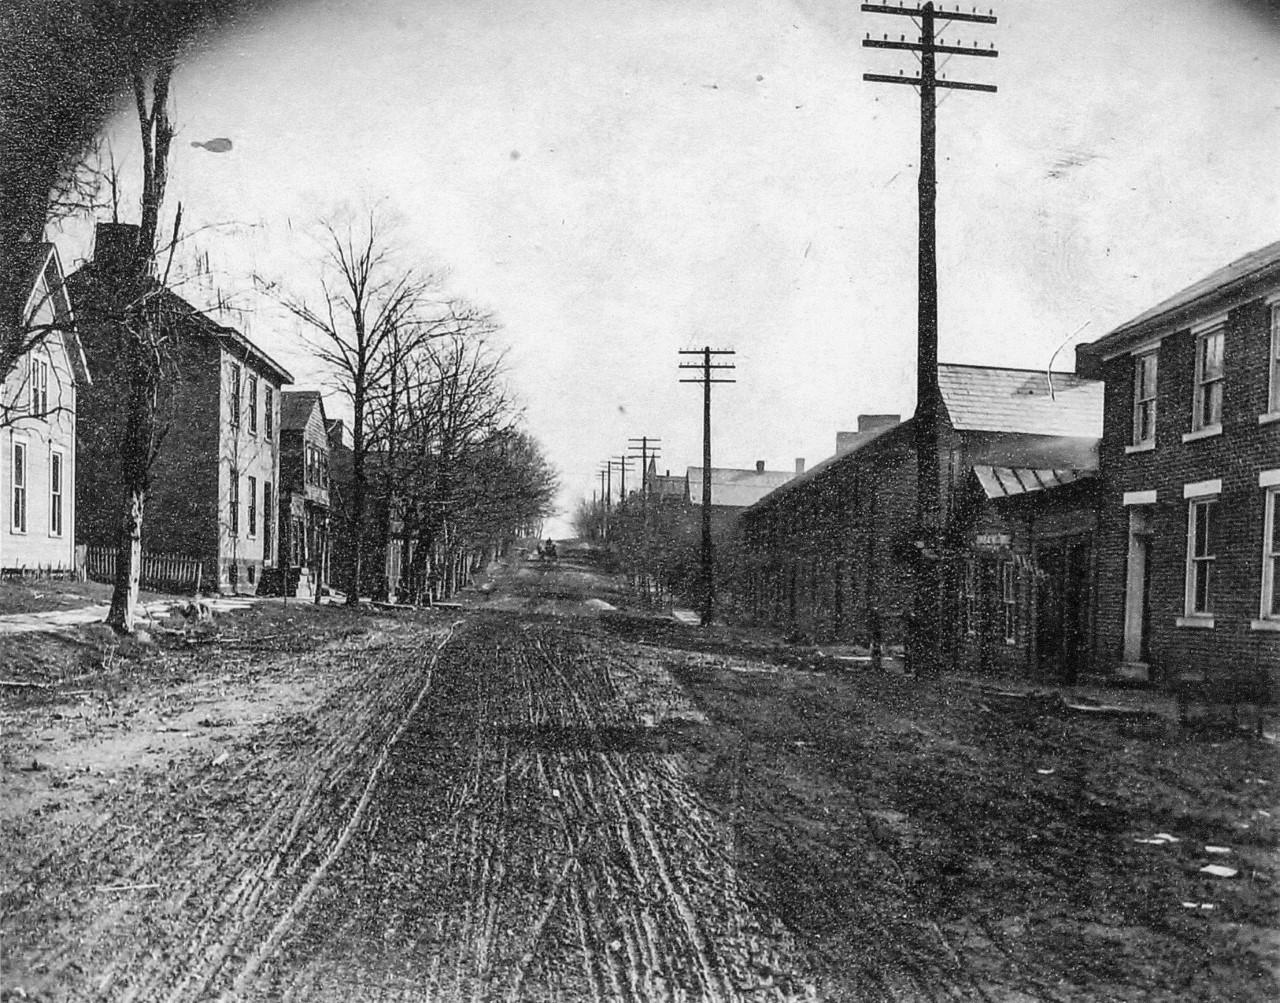 Fairview Main Street - small